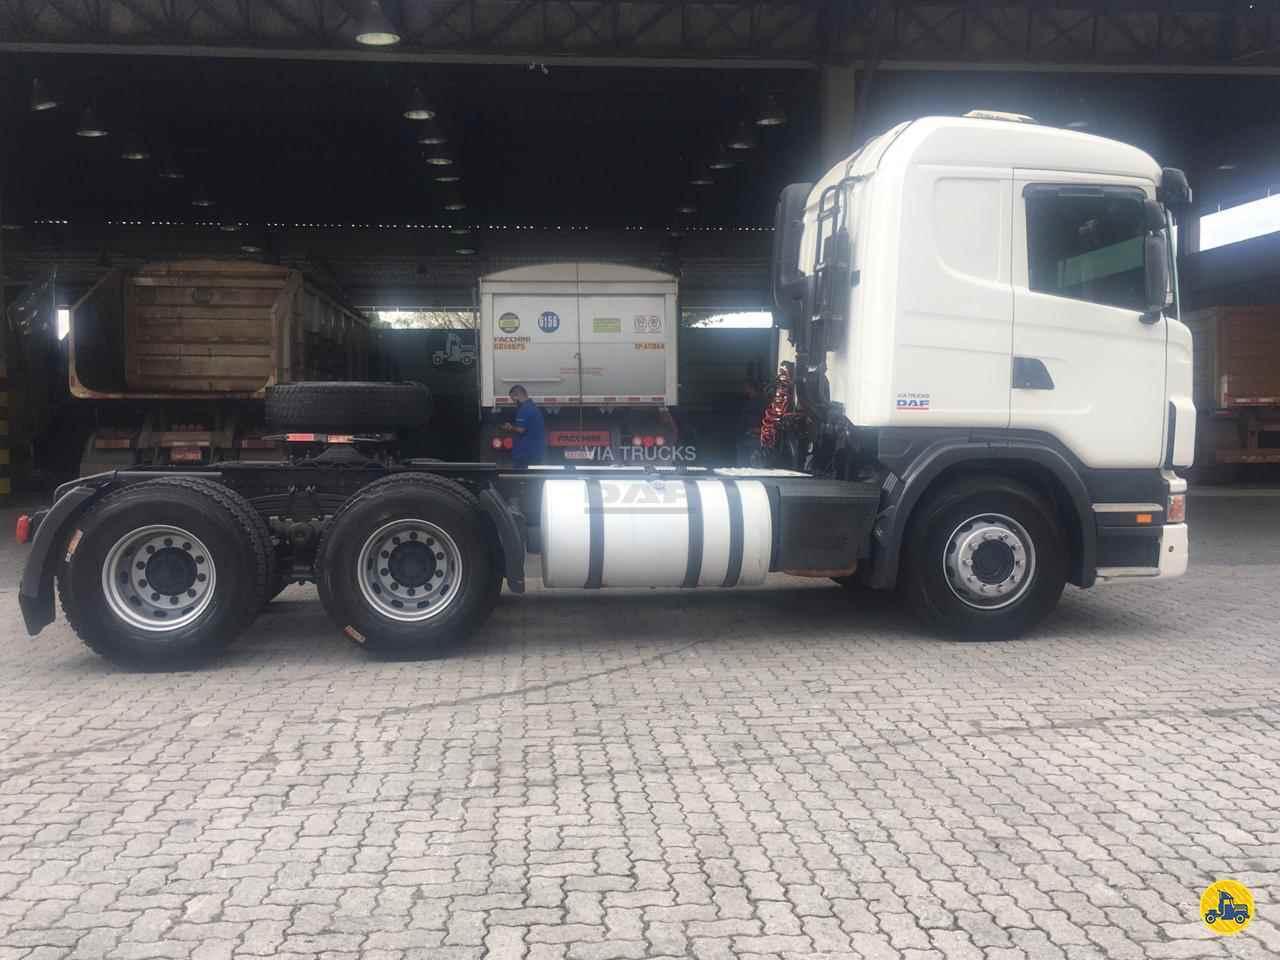 SCANIA SCANIA 420 895km 2011/2011 Via Trucks - DAF